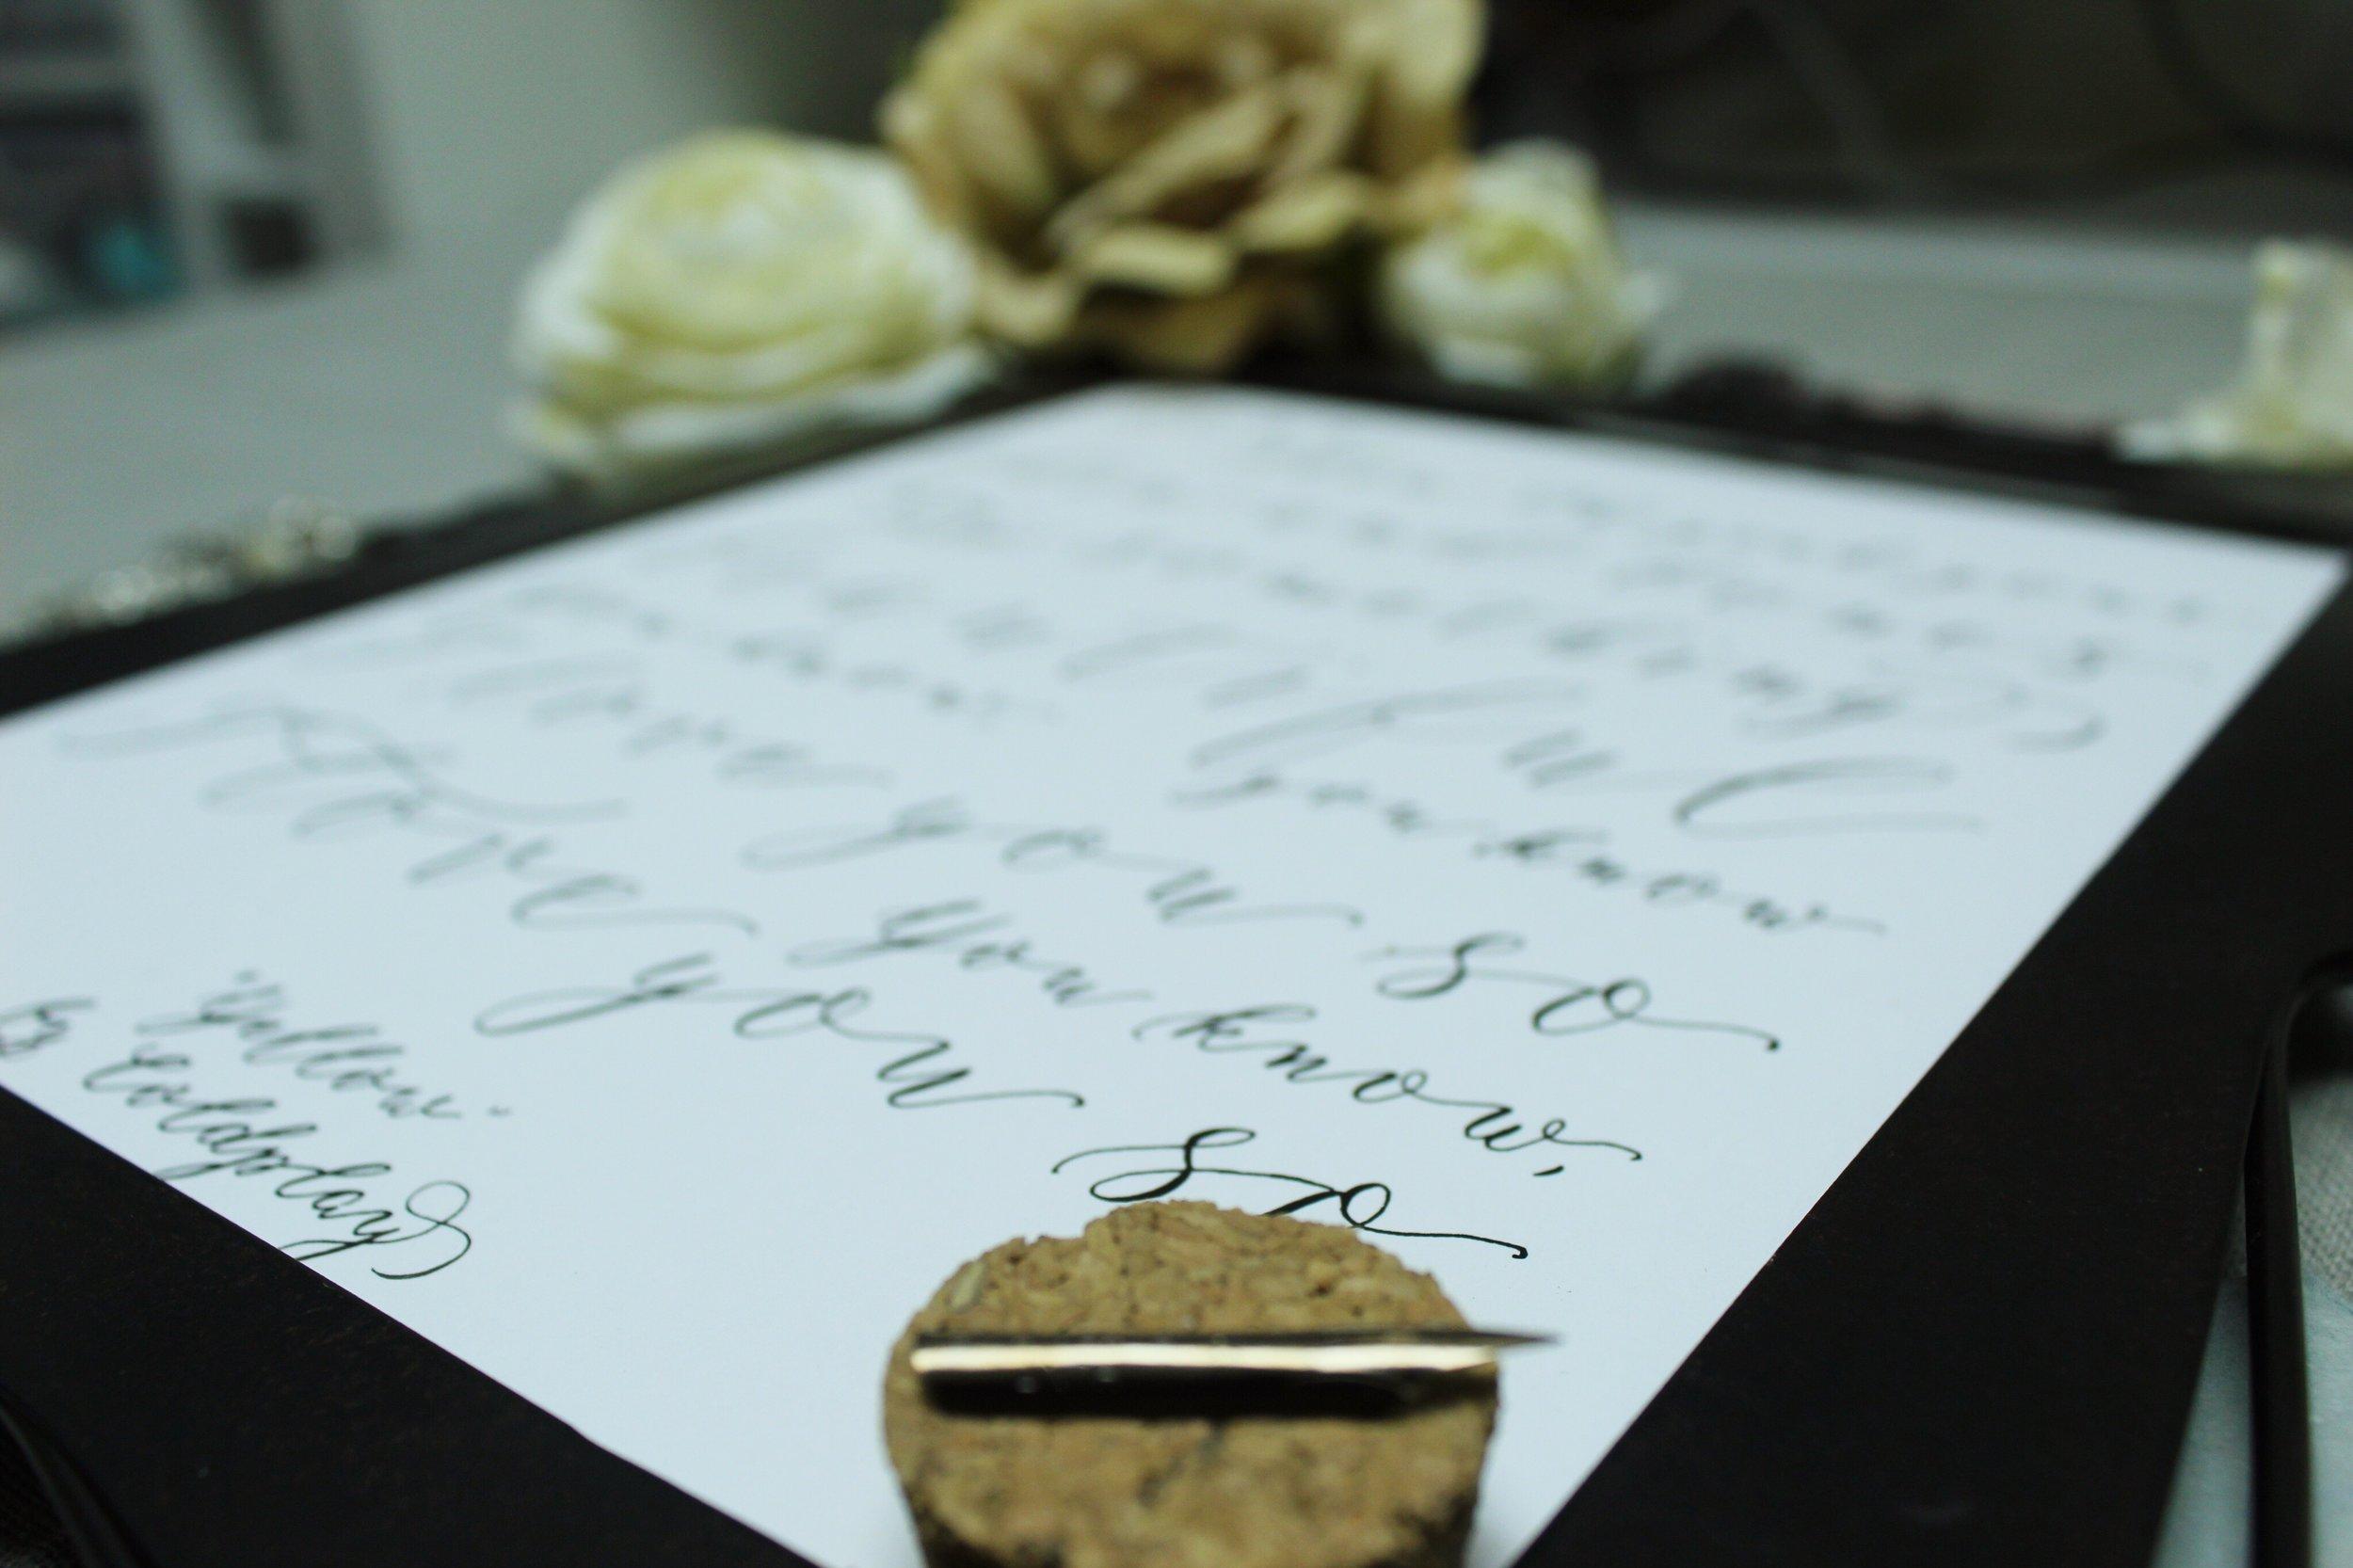 Central PA, York PA, JesSmith Designs, custom, wedding, invitations, bridal, announcements, save the date, baby, hanover, calligraphy, baltimore, wedding invitations, lancaster, gettysburg-05-13 22.13.27.jpg